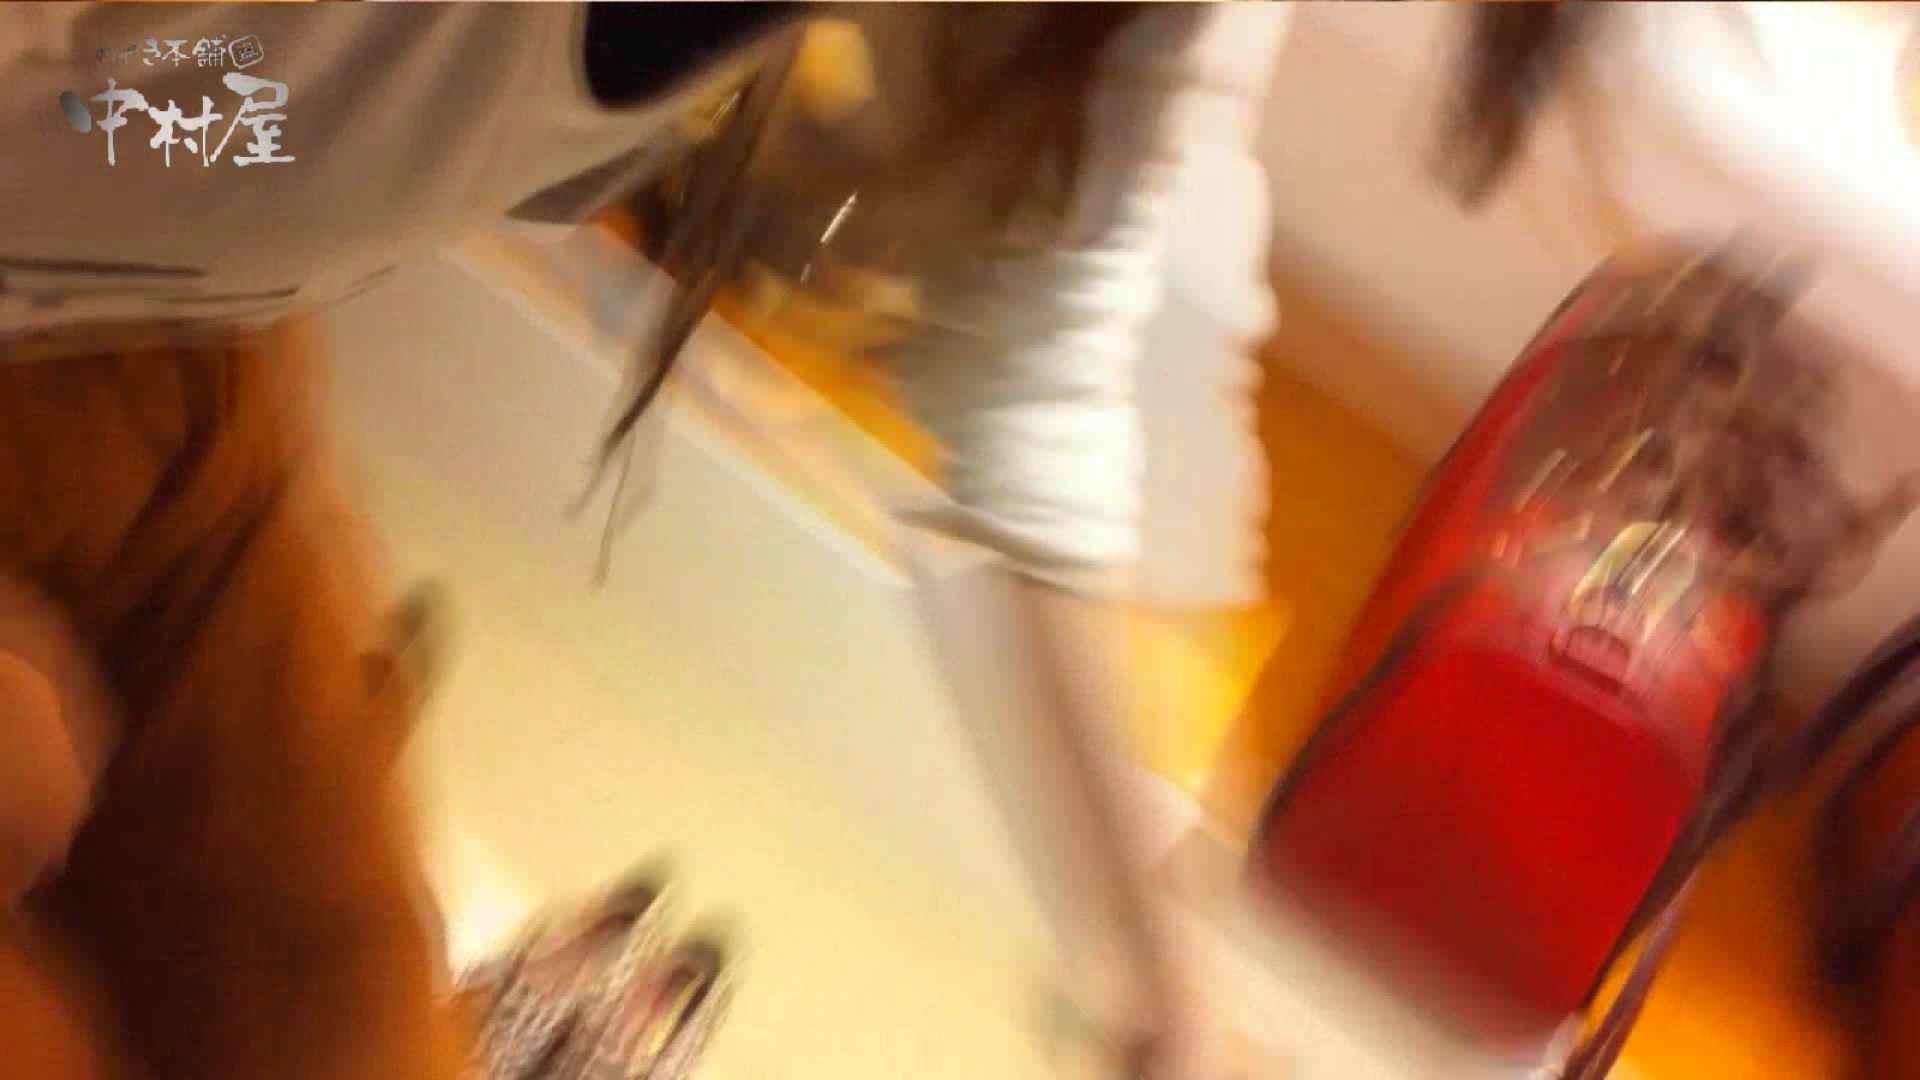 vol.83 美人アパレル胸チラ&パンチラ 赤Tバック店員さんいらっしゃい チラ | OL女体  94連発 55